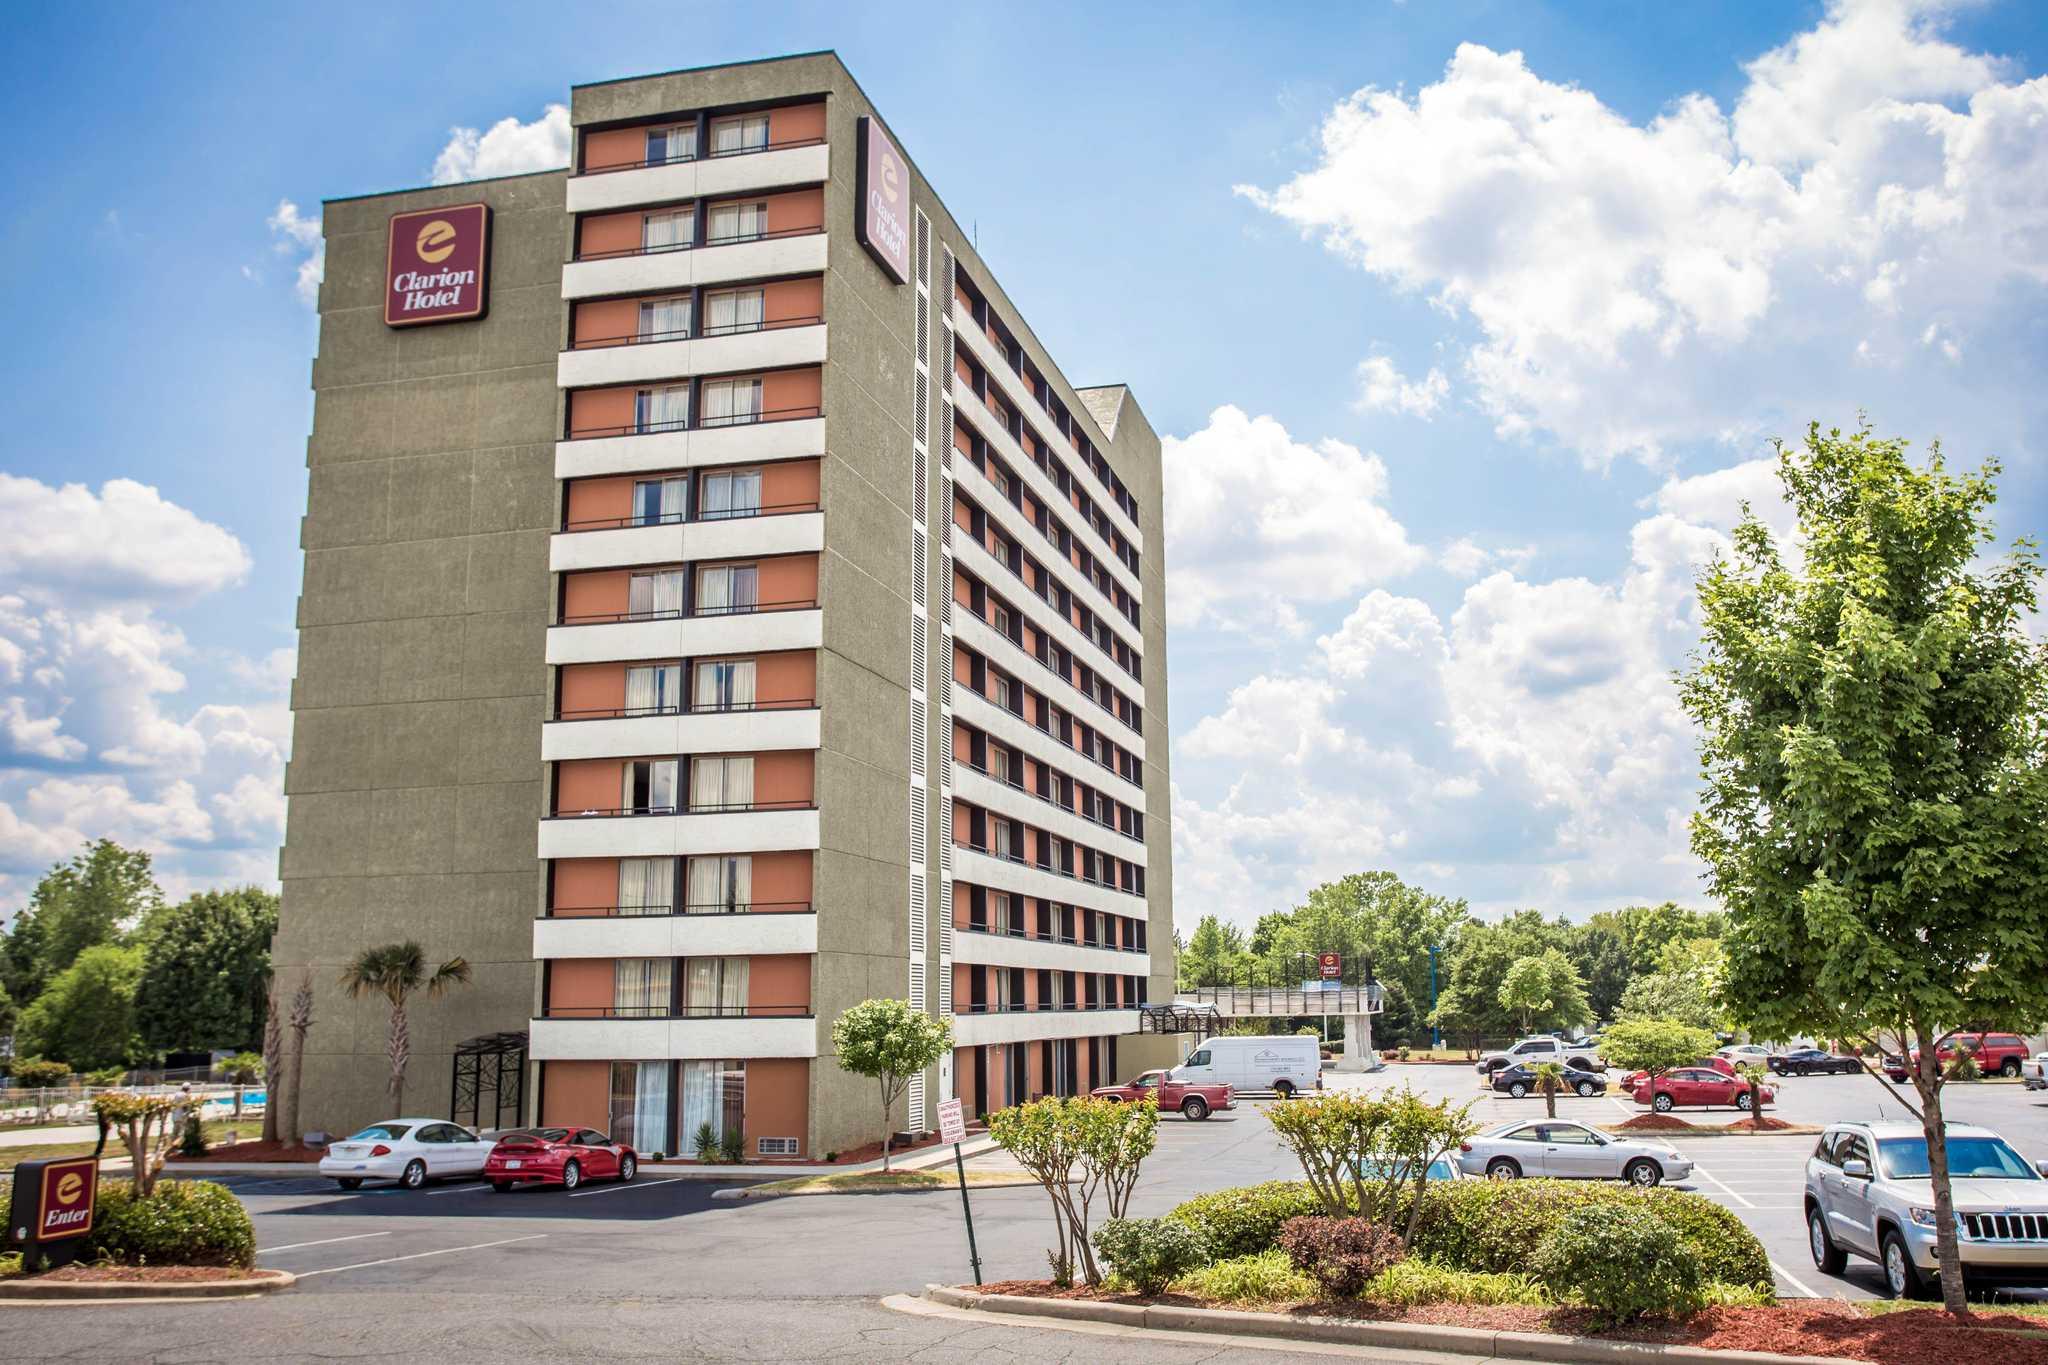 clarion hotel at carowinds in fort mill sc 803 548 2. Black Bedroom Furniture Sets. Home Design Ideas